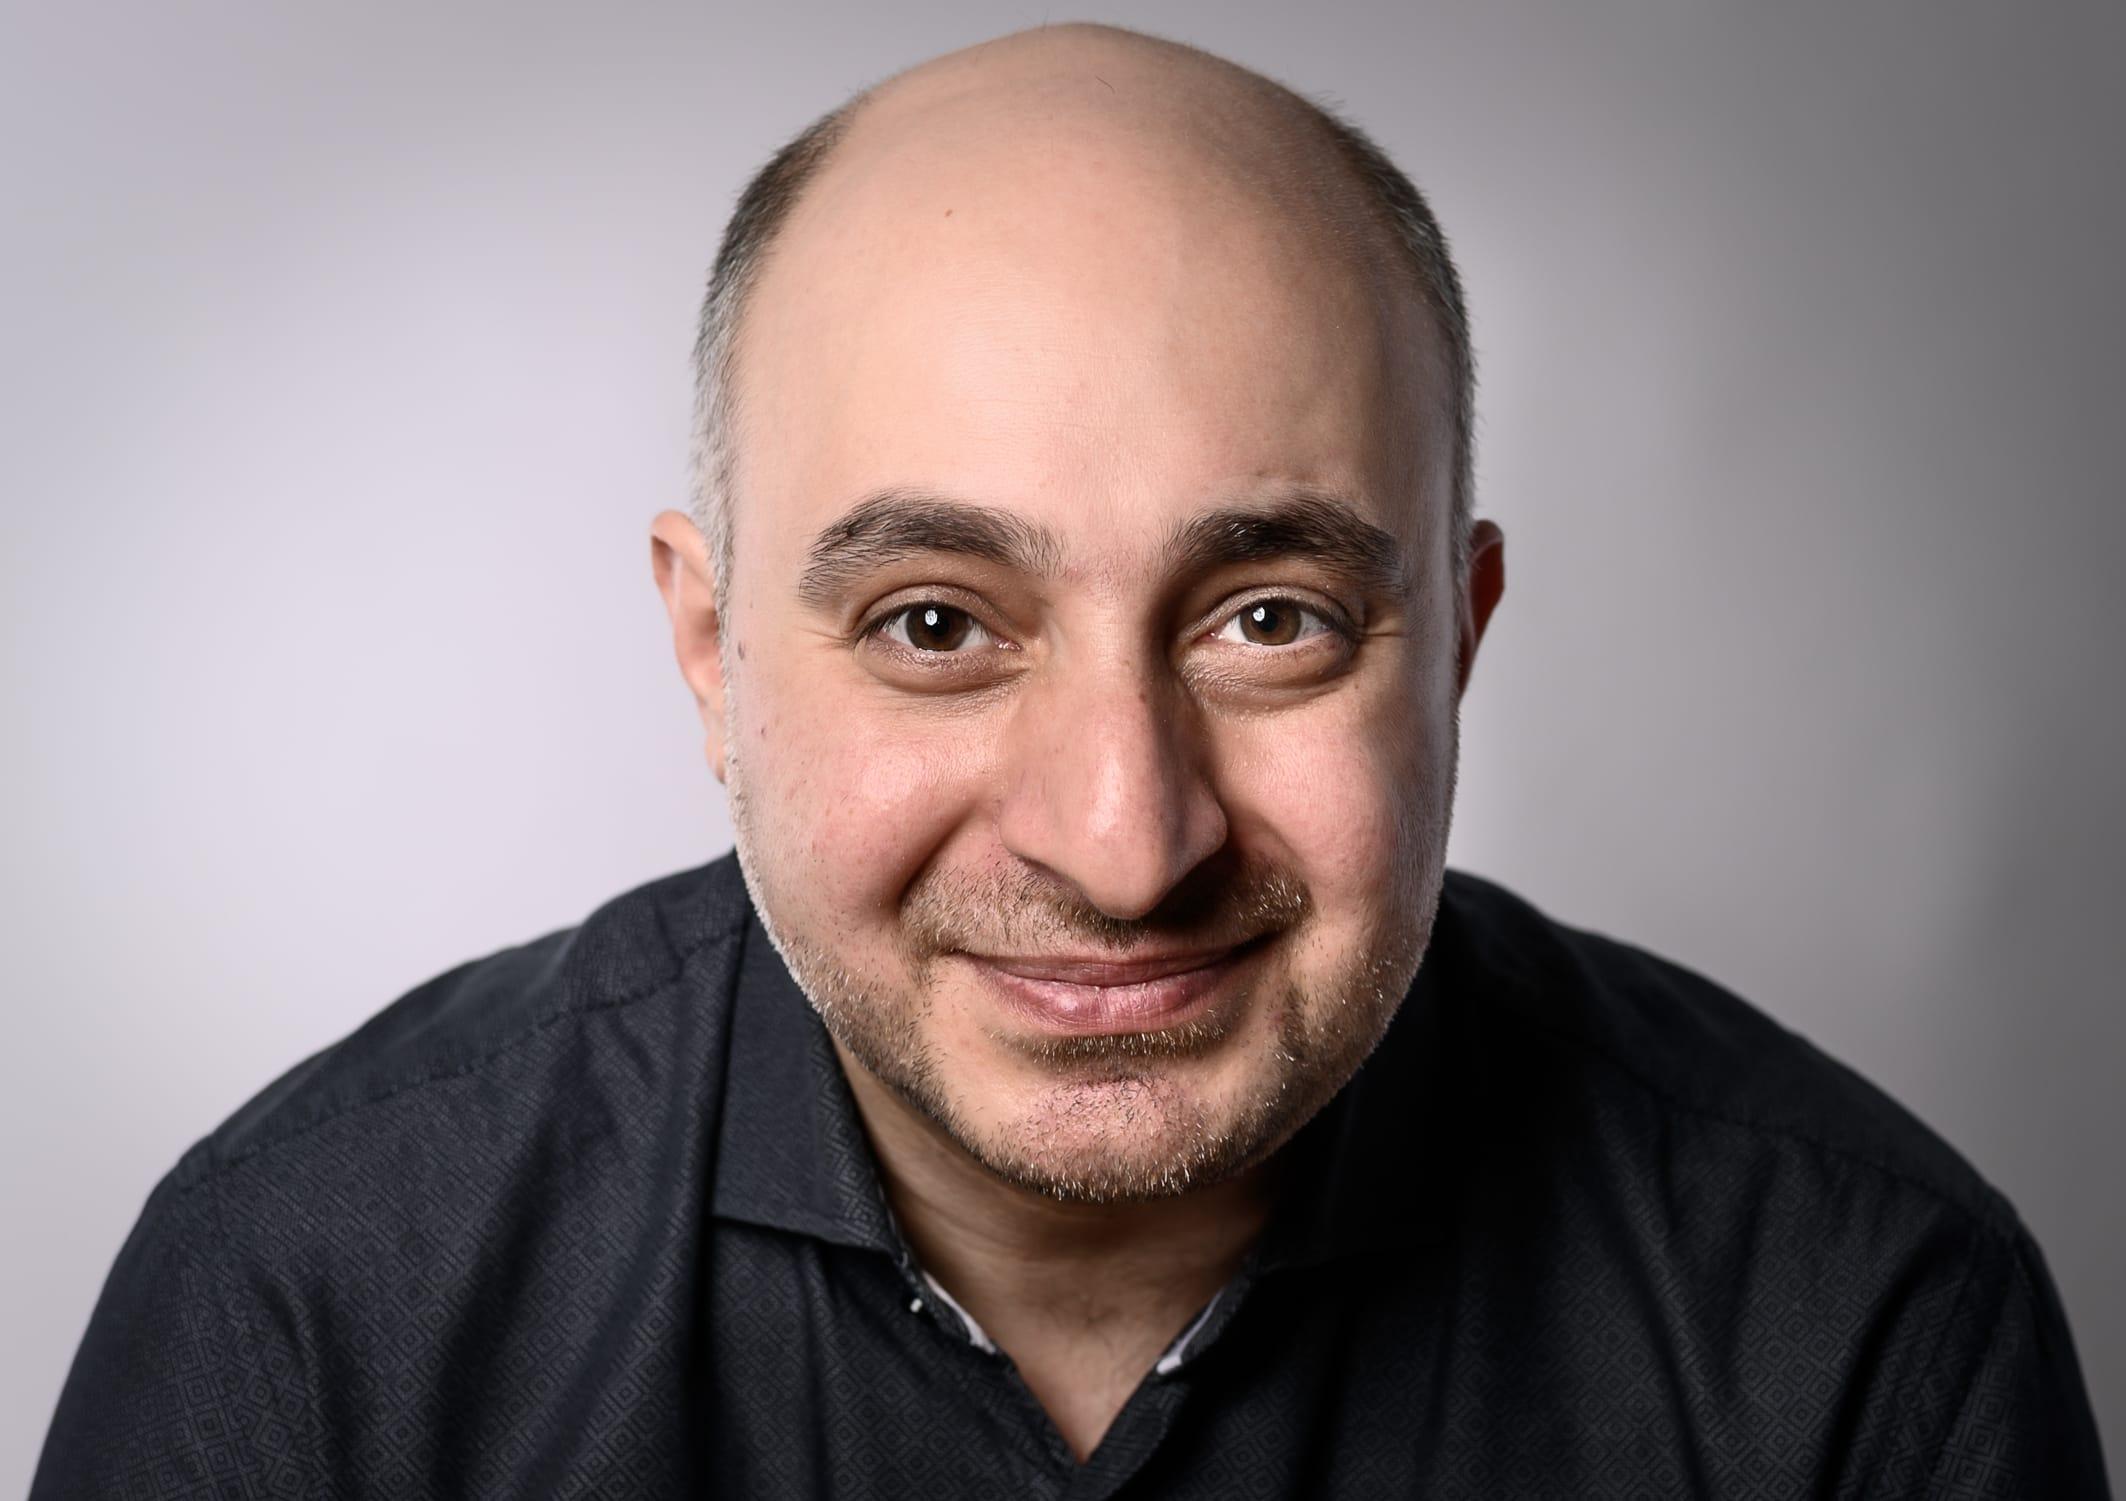 portrait Foto von Ramin Varzandeh